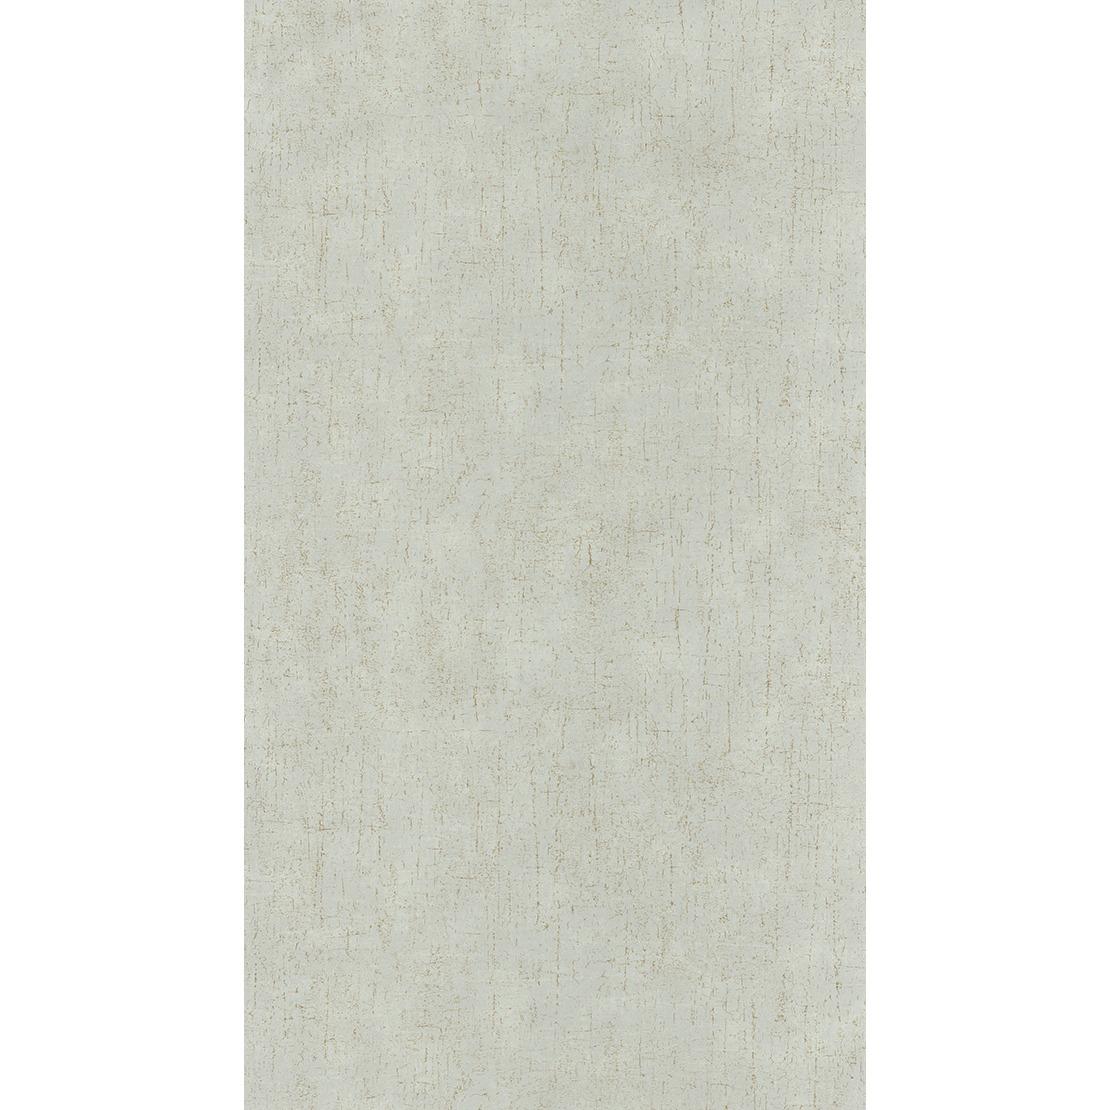 Французские обои Casadeco,  коллекция Oxyde, артикулOXY29111126